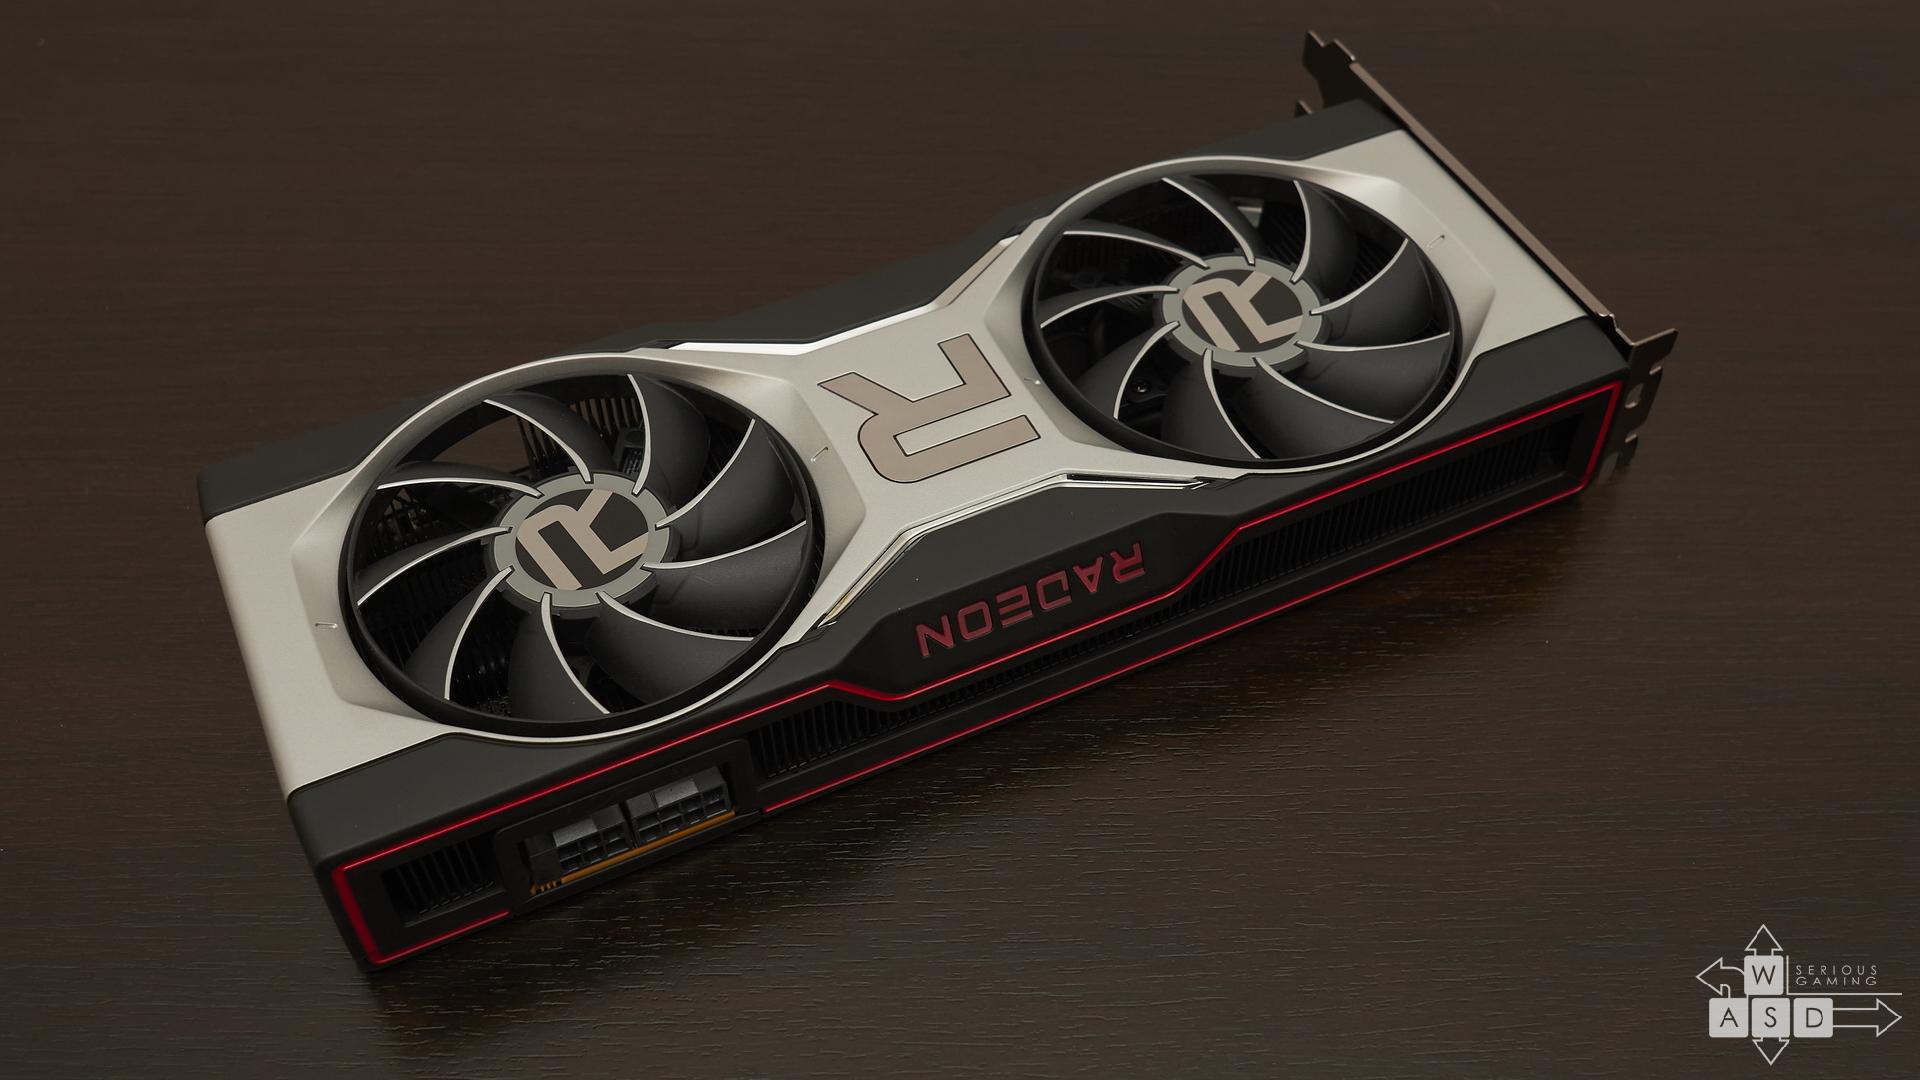 AMD Radeon RX 6700 XT review | WASD